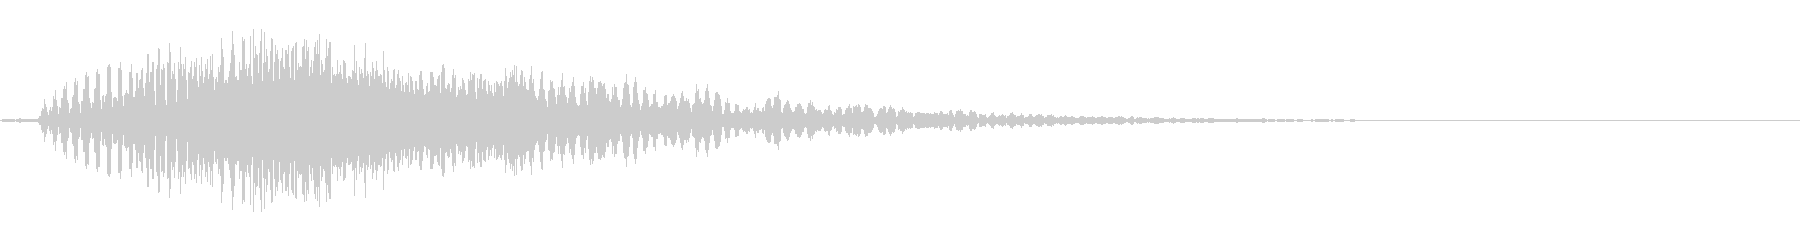 SF 開閉音 7の未再生の波形